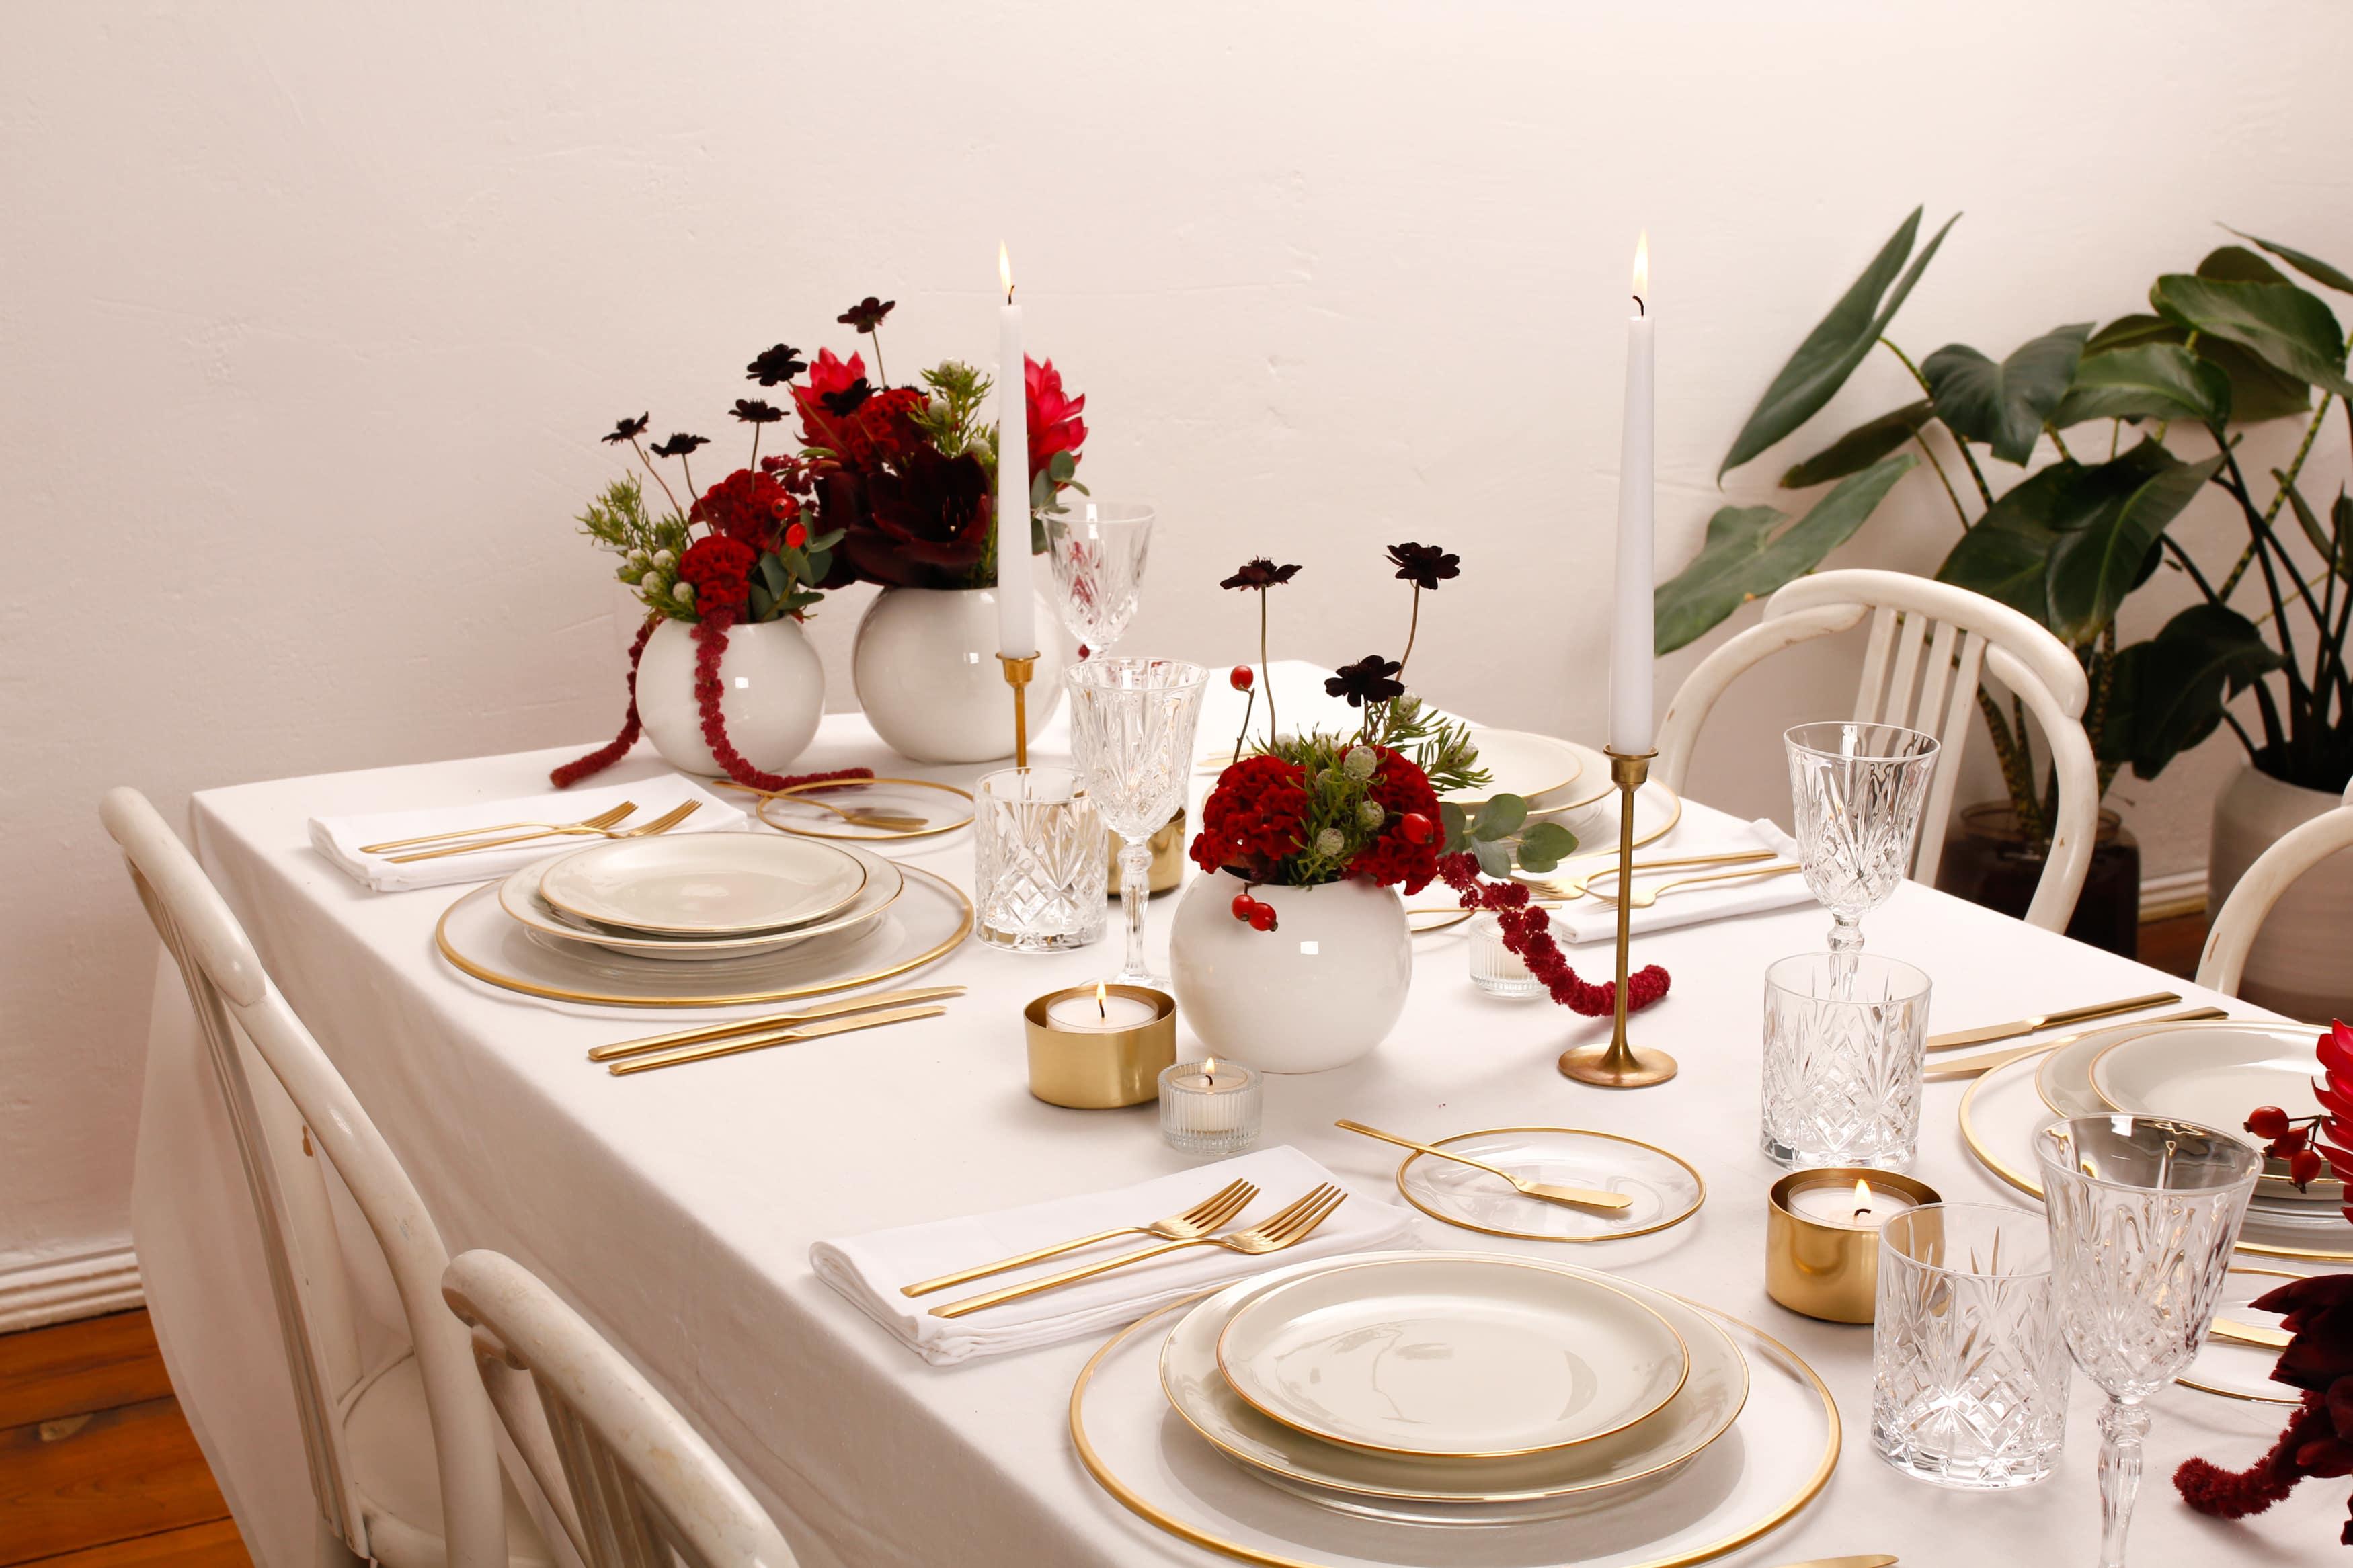 geschirrsets mieten hygienisch sauber, dekoration, kerzen weihnachten